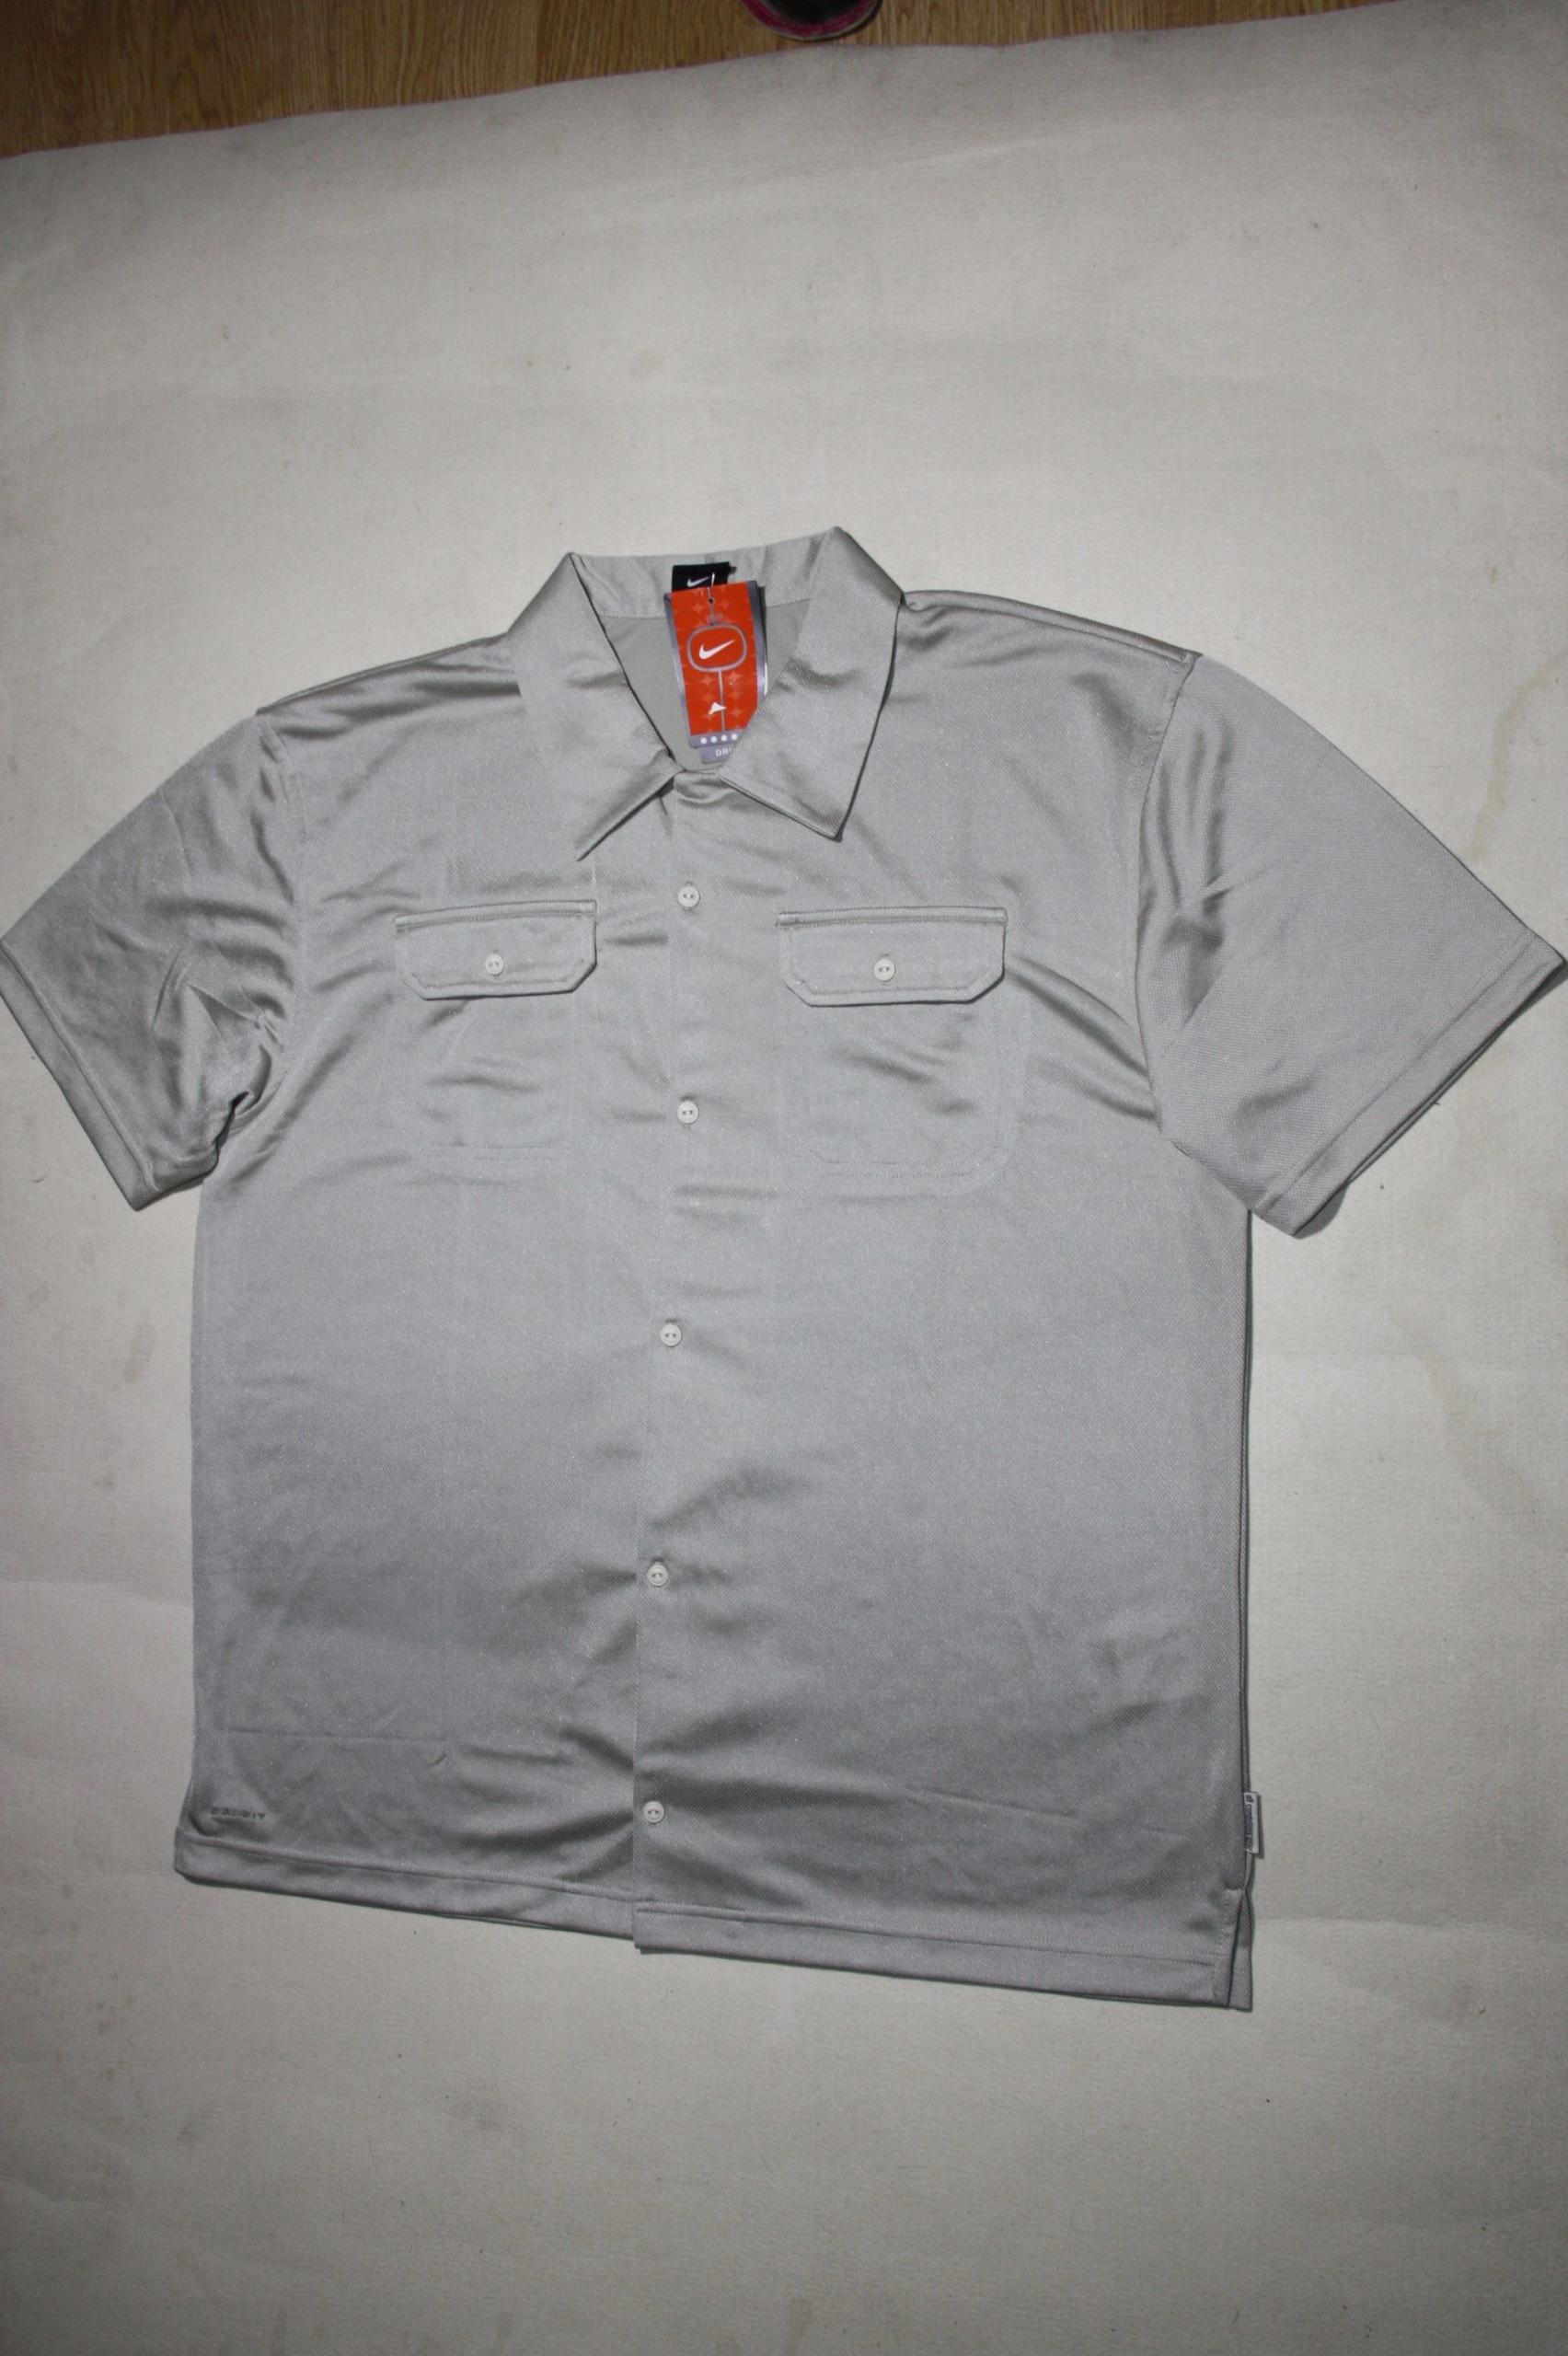 NIKE DRI Fit koszulka męska, r. XL